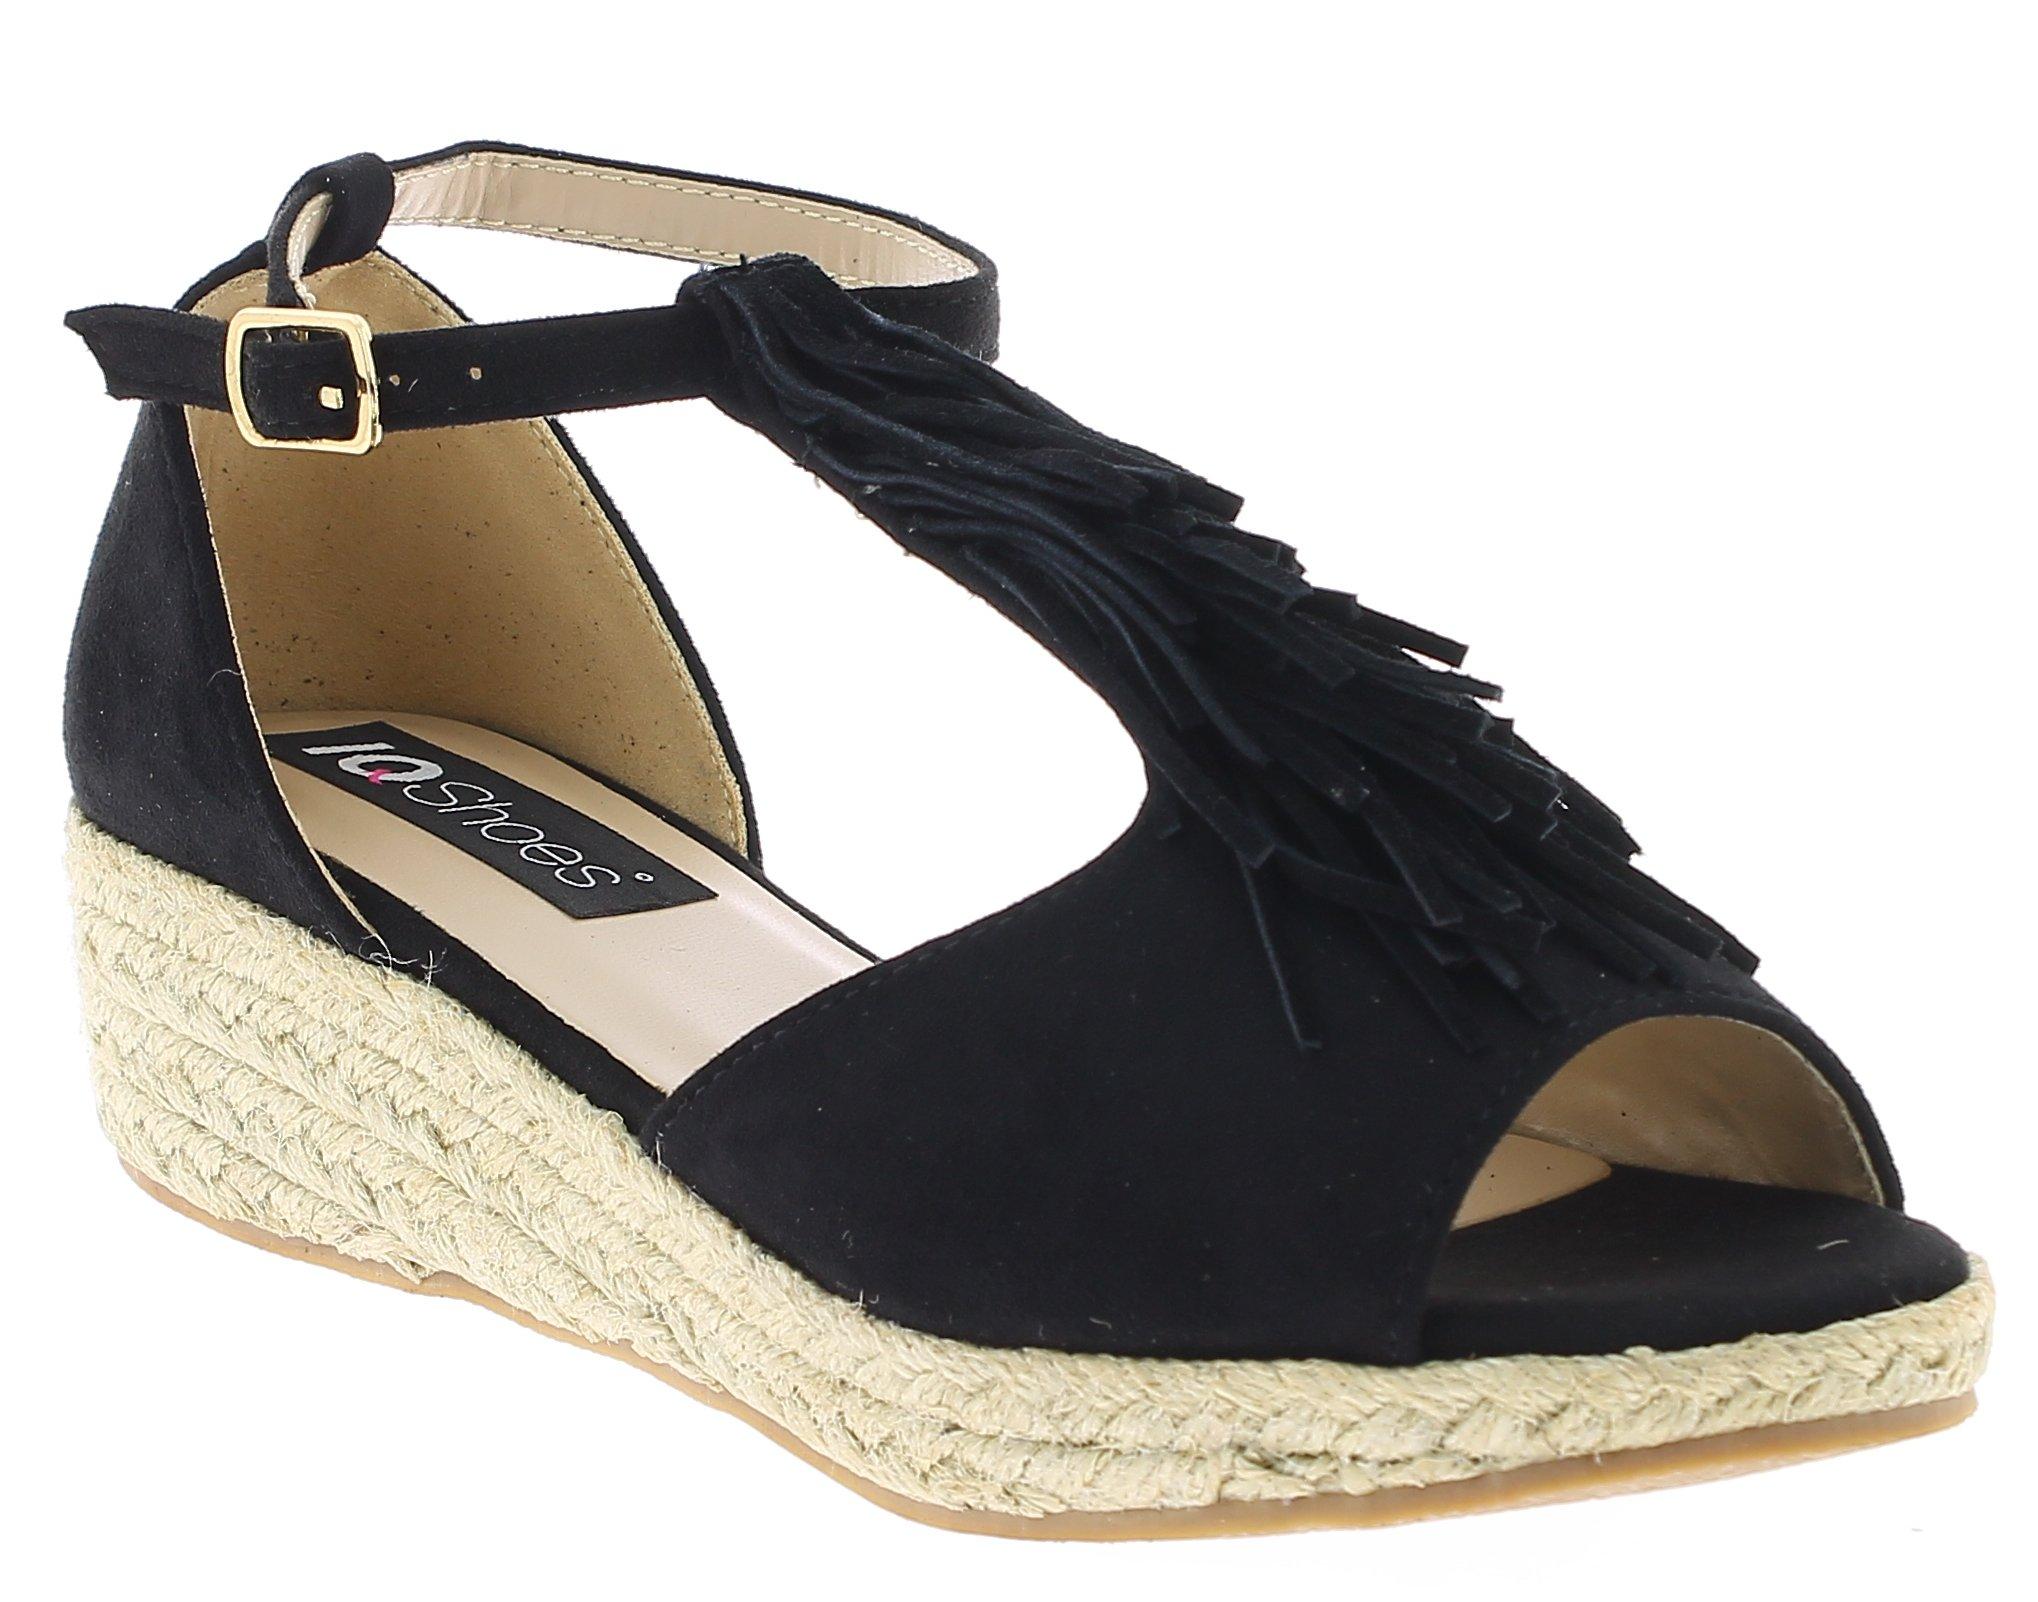 IQSHOES Γυναικείο Πέδιλο 3H048 Μαύρο - IqShoes - 18.3H048 BLACK -IQSHOES-black-3 παπούτσια  γυναικεία σανδάλια   πέδιλα